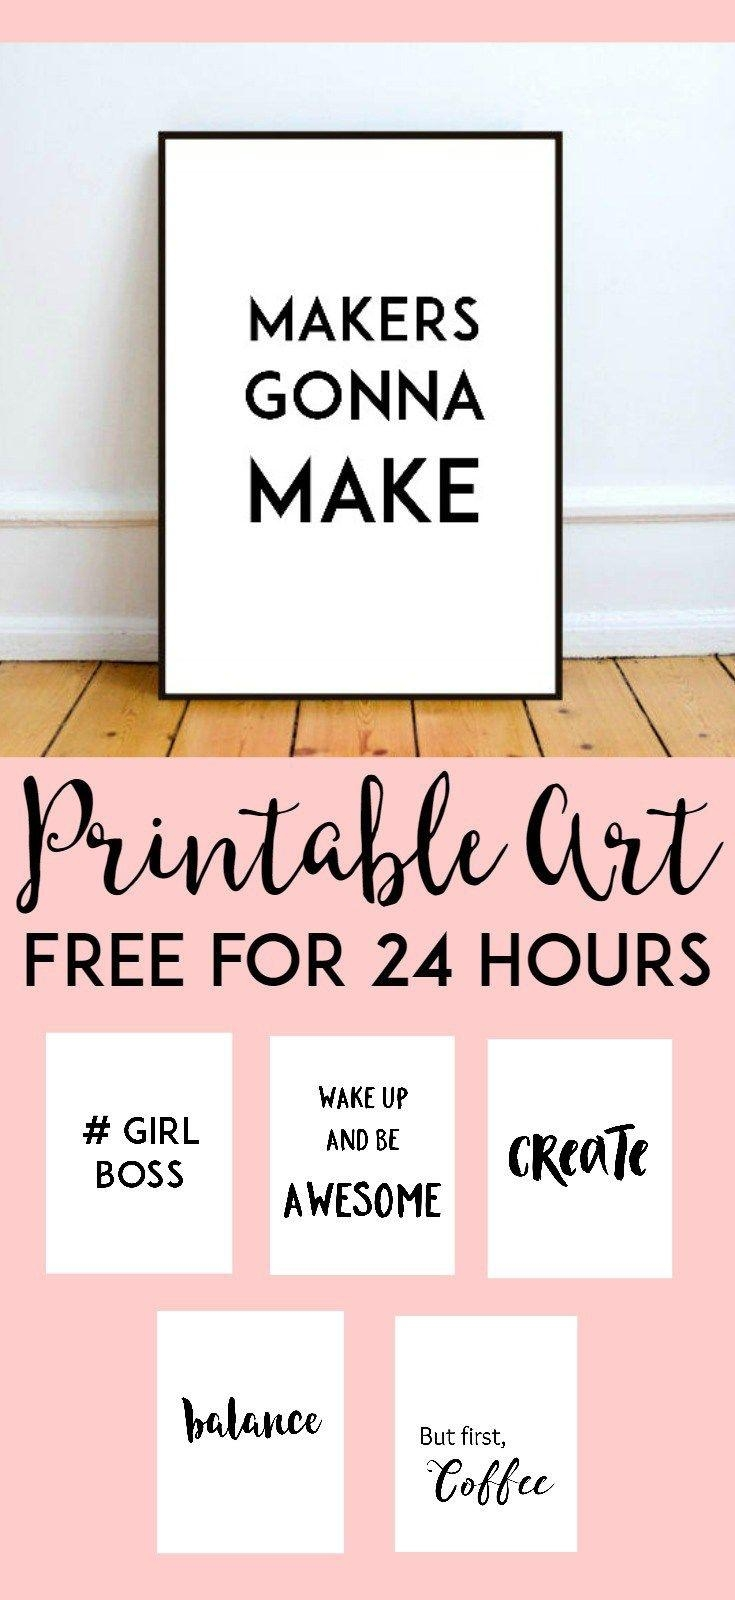 Best 25+ Inspirational Wall Art Ideas On Pinterest | Free Pertaining To Inspirational Wall Art For Office (Image 4 of 20)